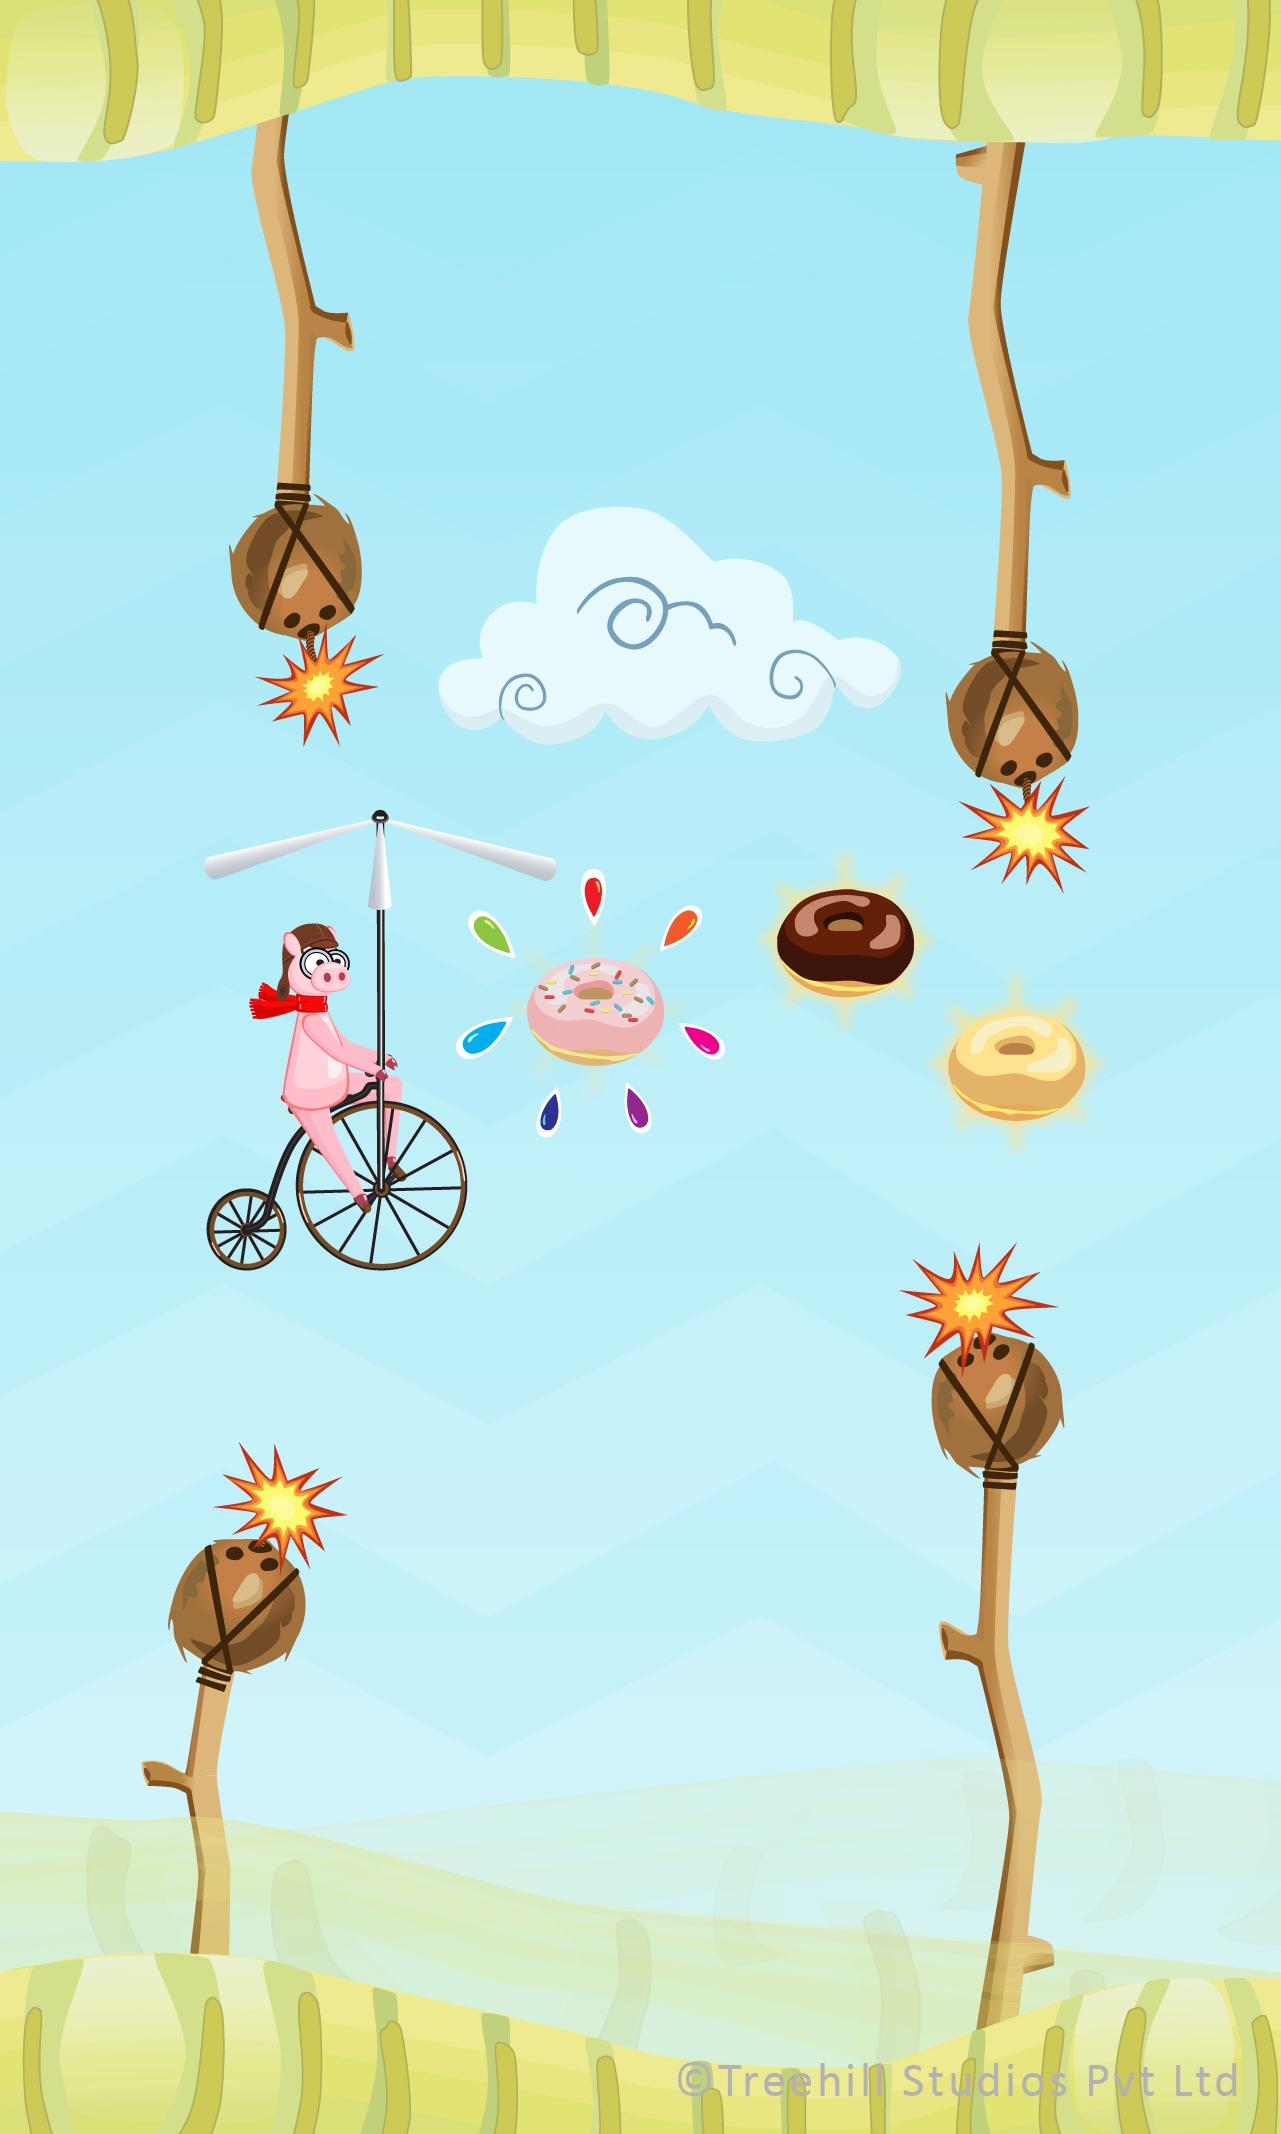 Bacon Quest Gameplay Screenshot01.jpg